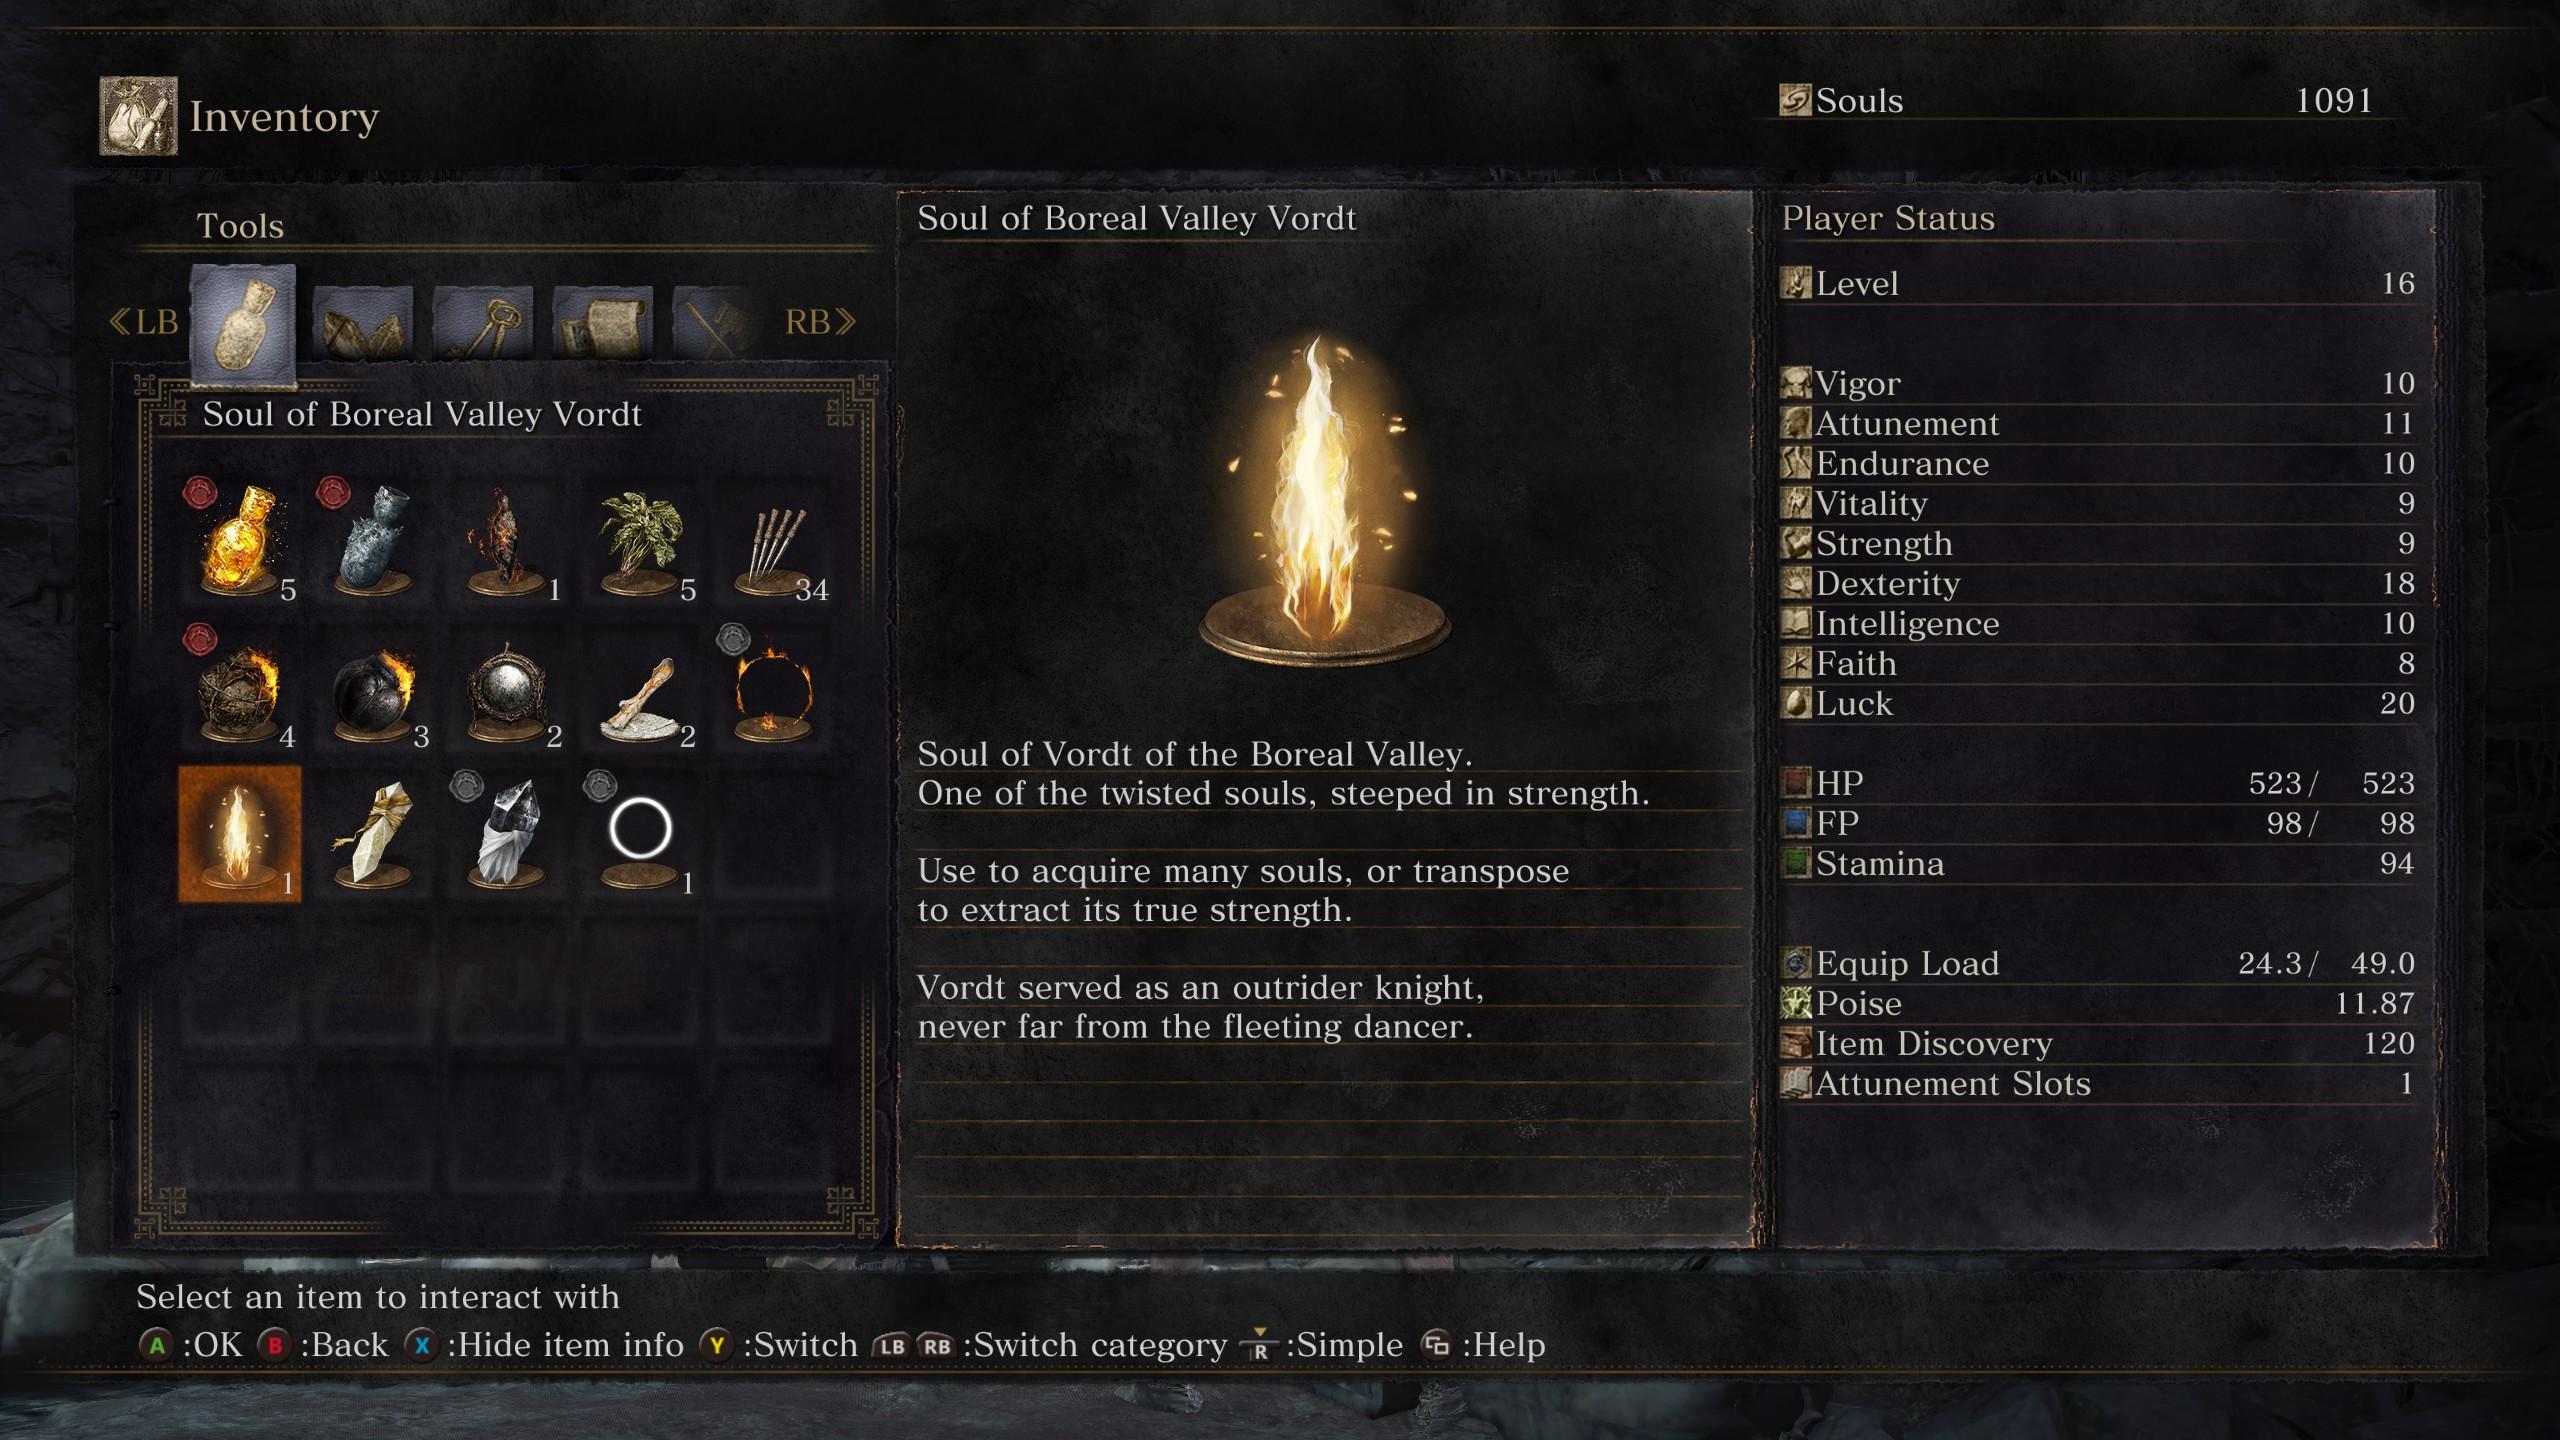 dark souls 3 guide transmutating boss souls into new weapons